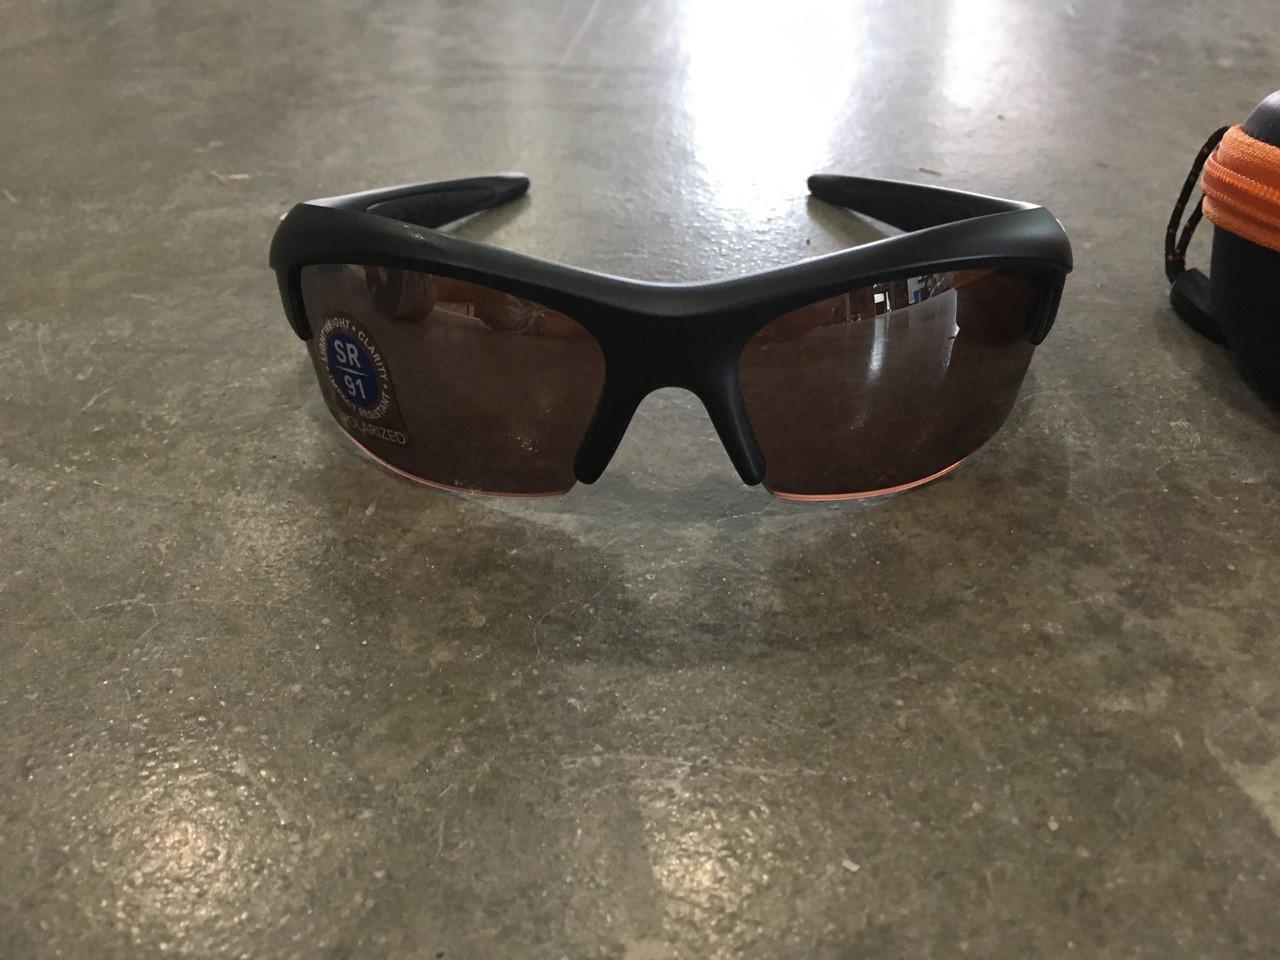 8ed1b2c561e Special - Kaenon Polarized Sunglasses - S-Kore - Matte Black White ...